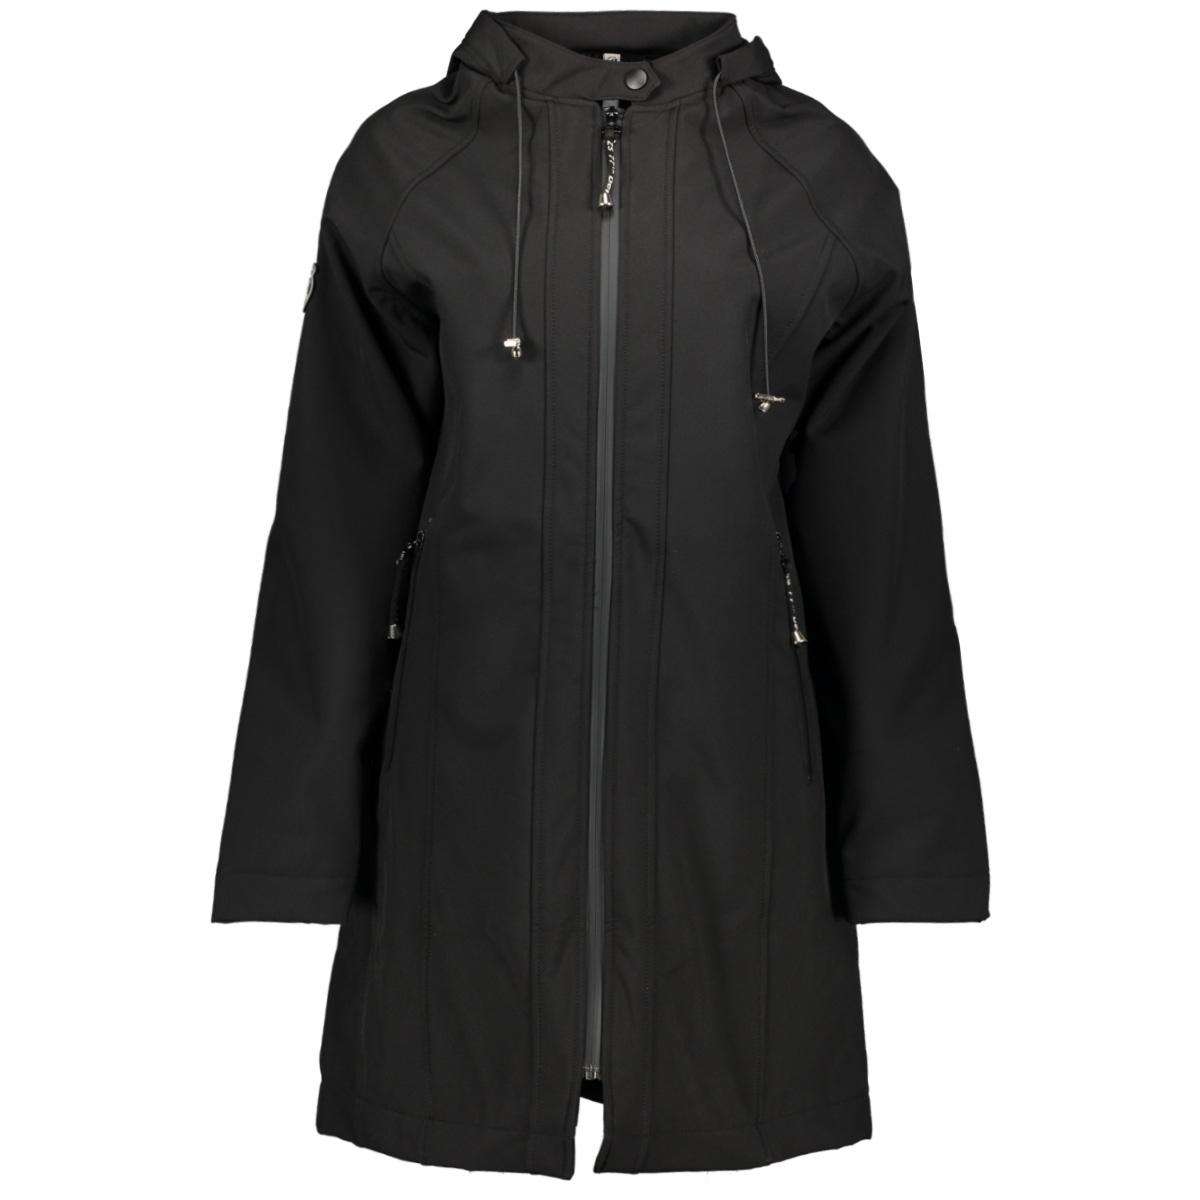 195 outdoor softshell jacket zoso jas black